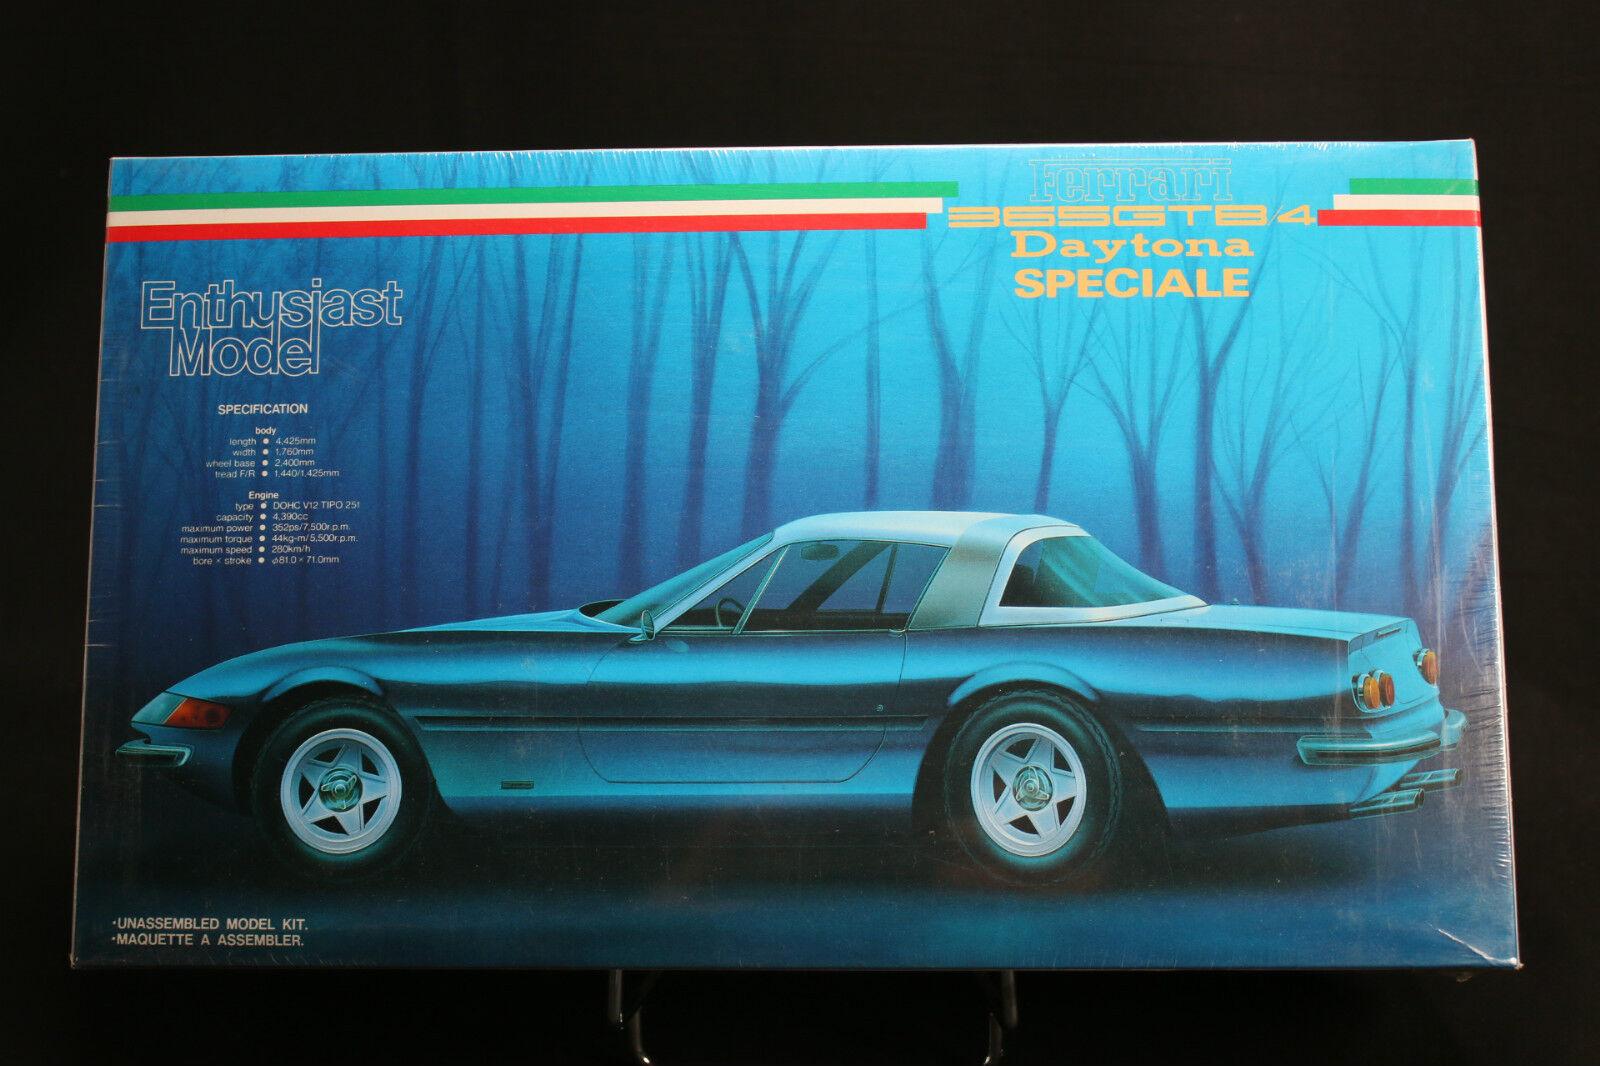 Xa015 fujimi 1 24 model car 08102 1800 ferrari 365gtb4 daytona special